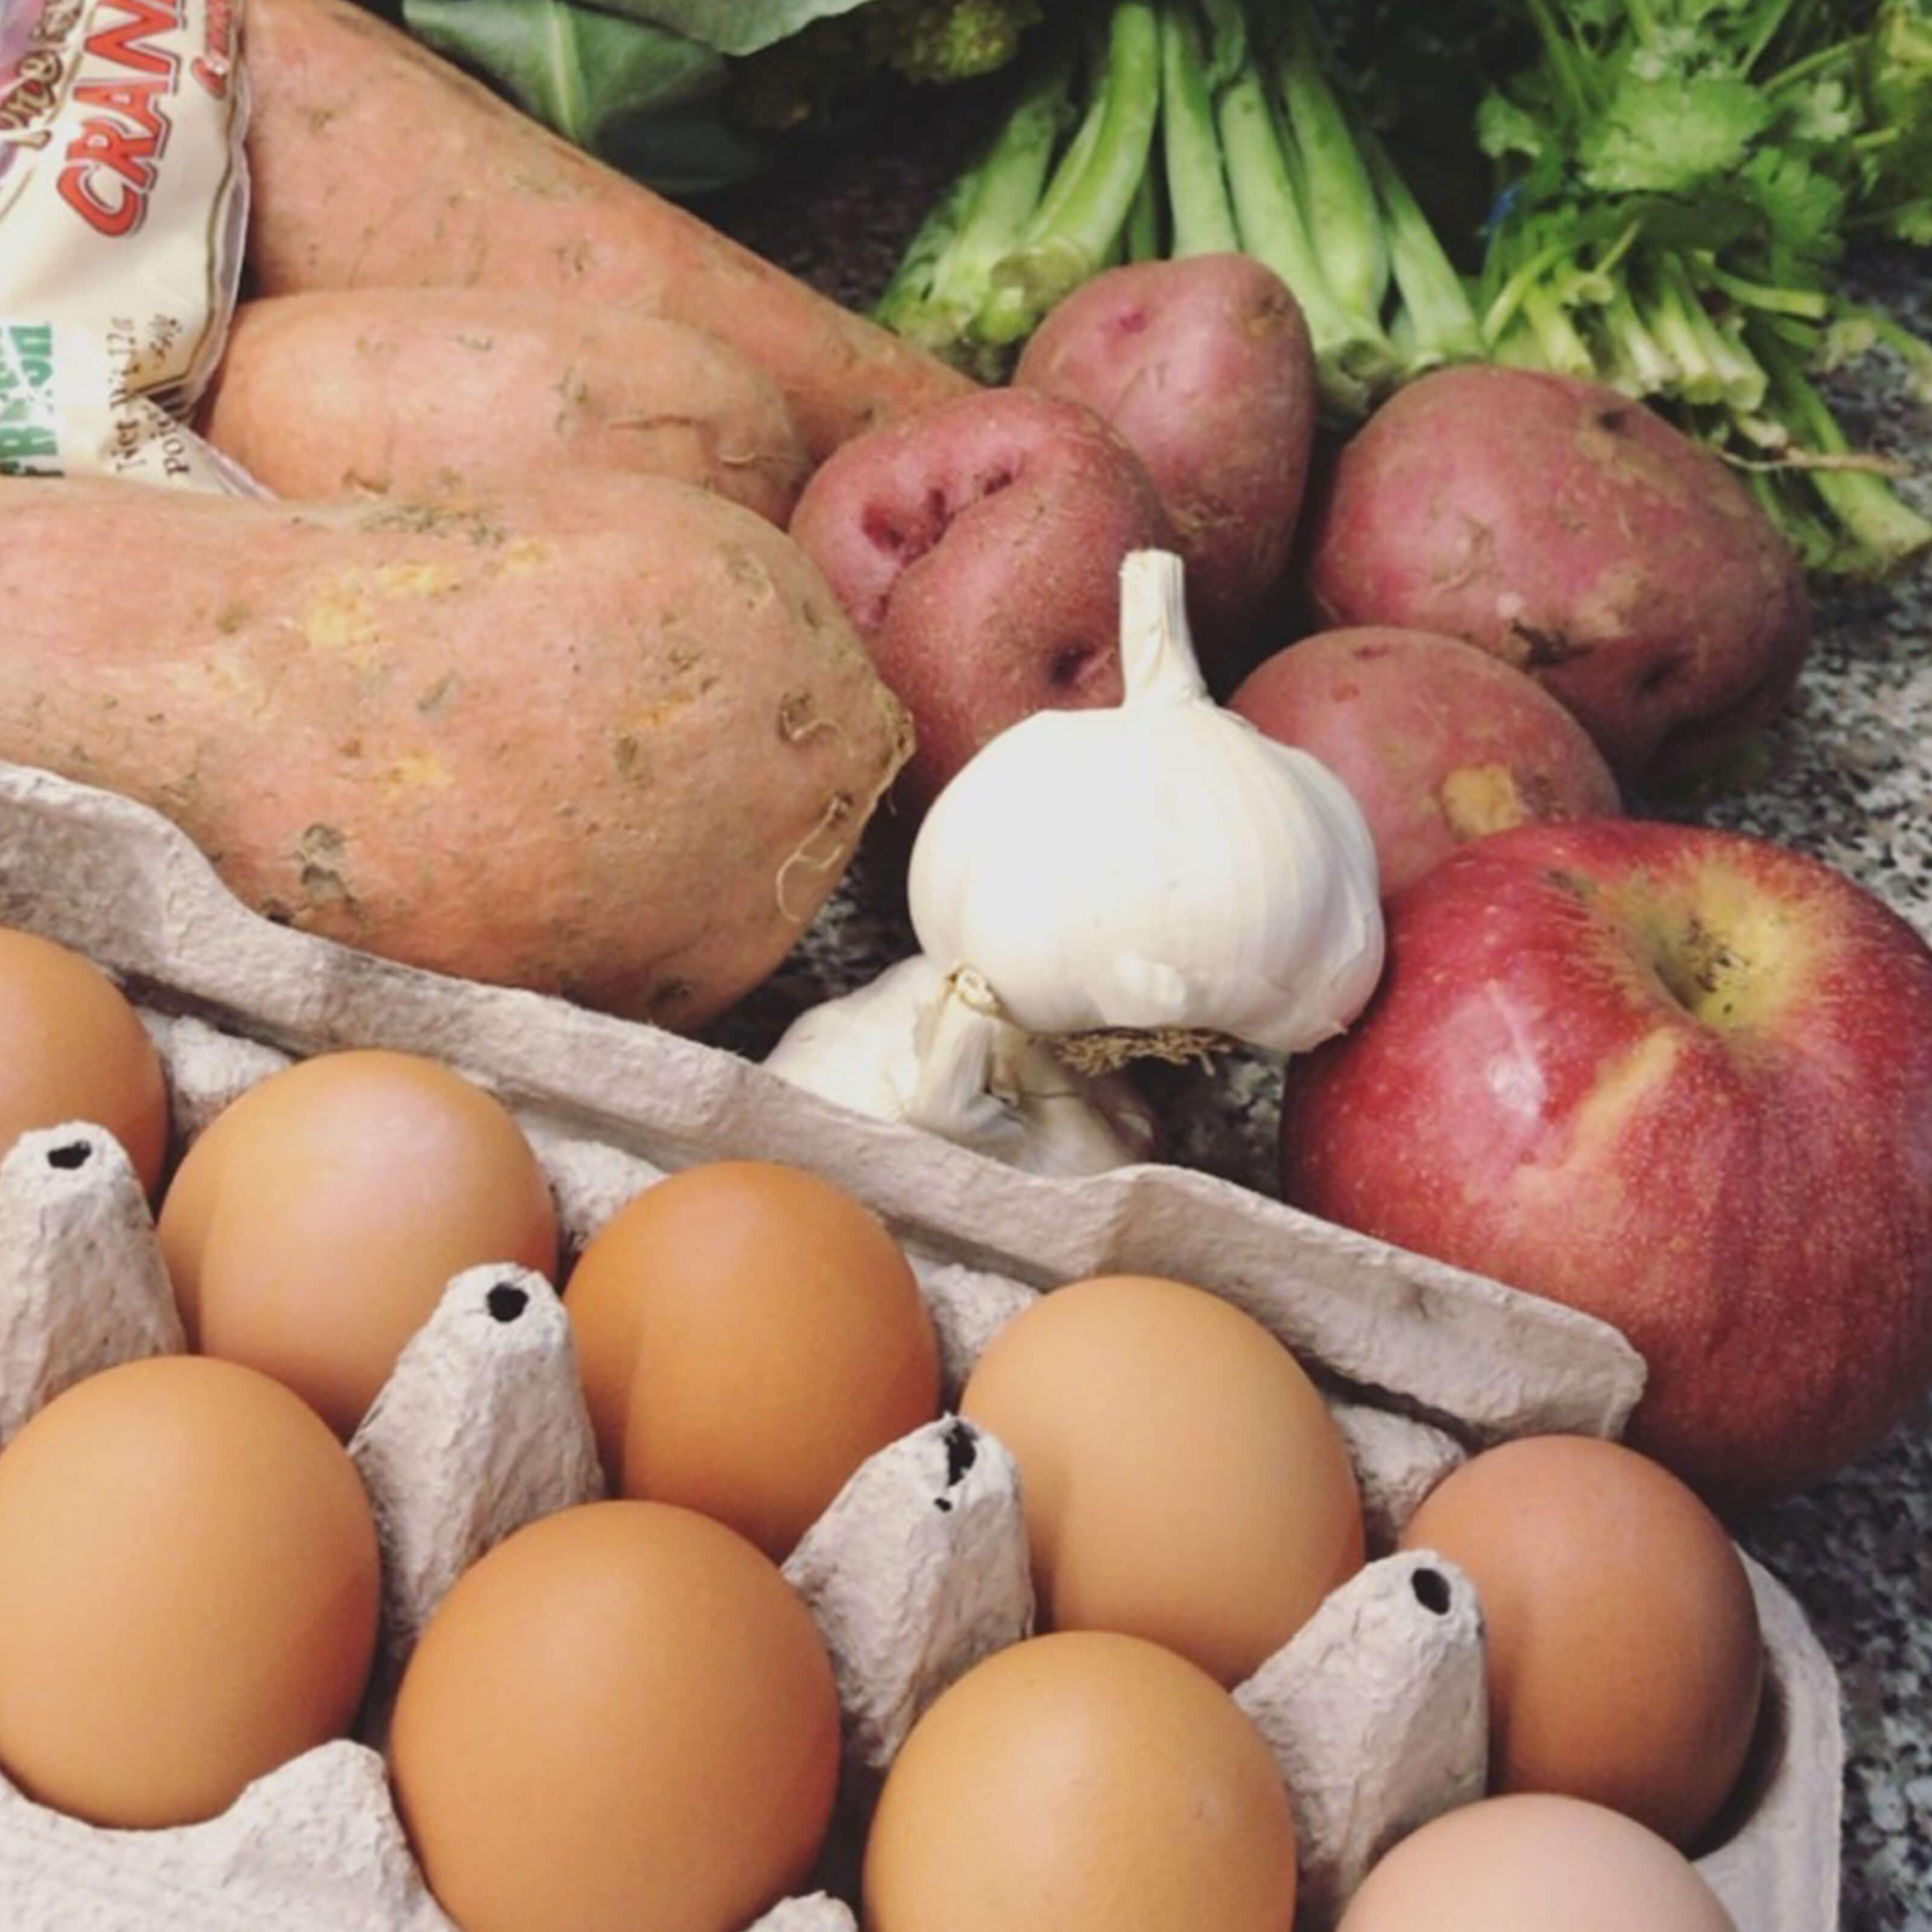 carton of eggs, apple, garlic, potatoes